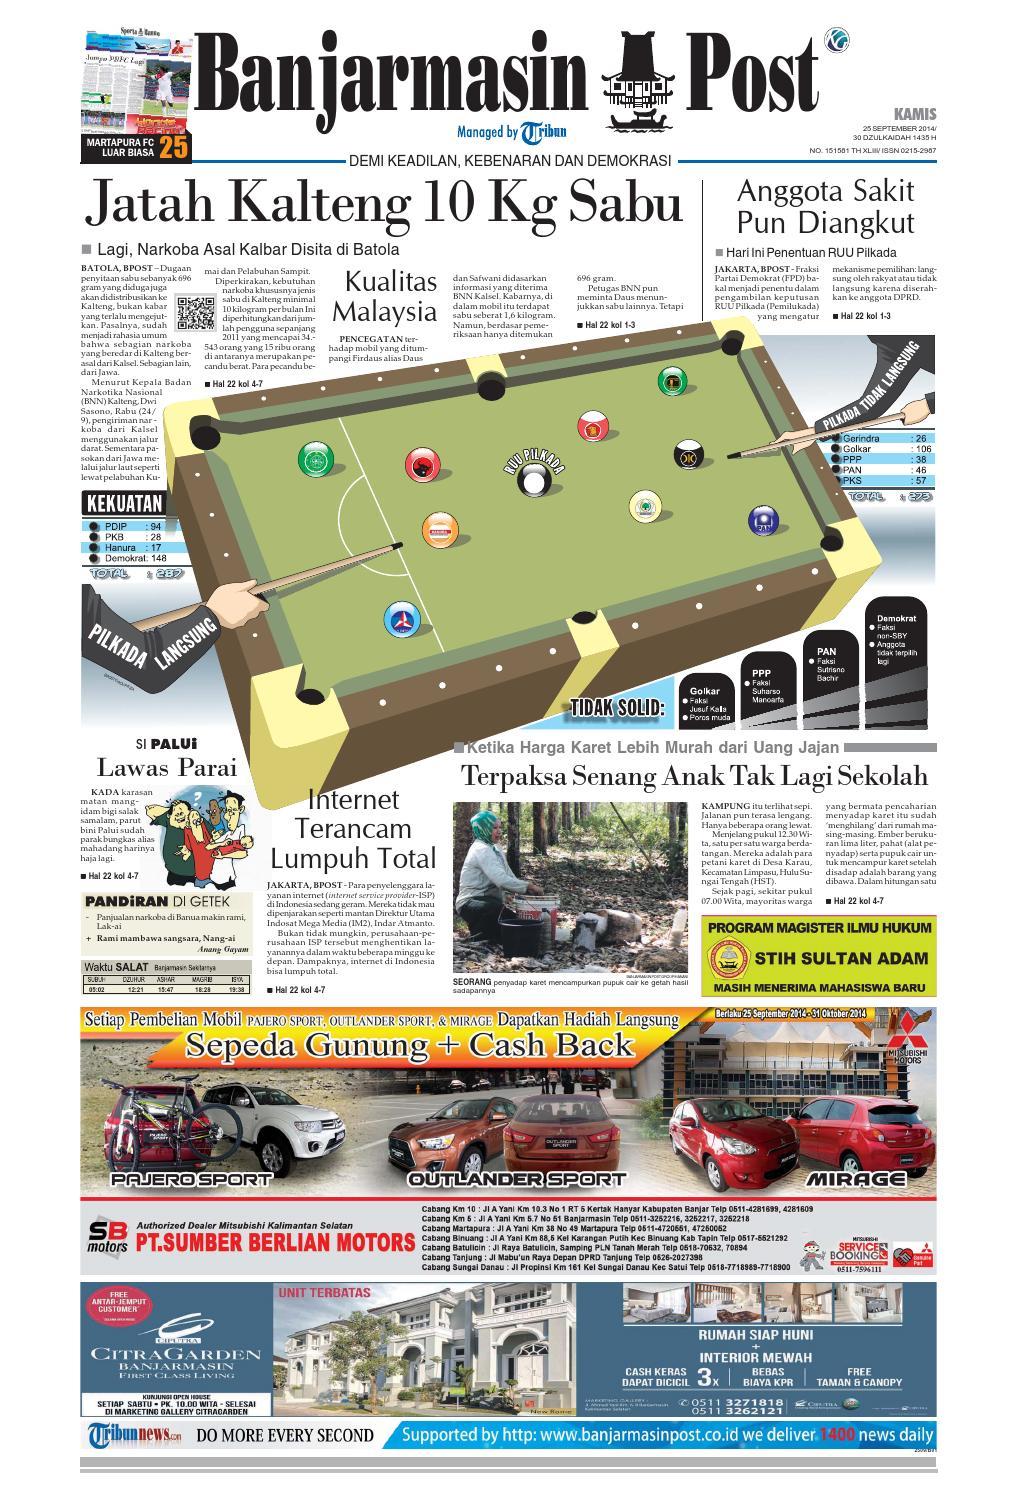 Banjarmasin Post Kamis 29 Mei 2014 By Issuu Tcash Vaganza 33 Paket 10 Pcs Susu Bear Brand 25 September